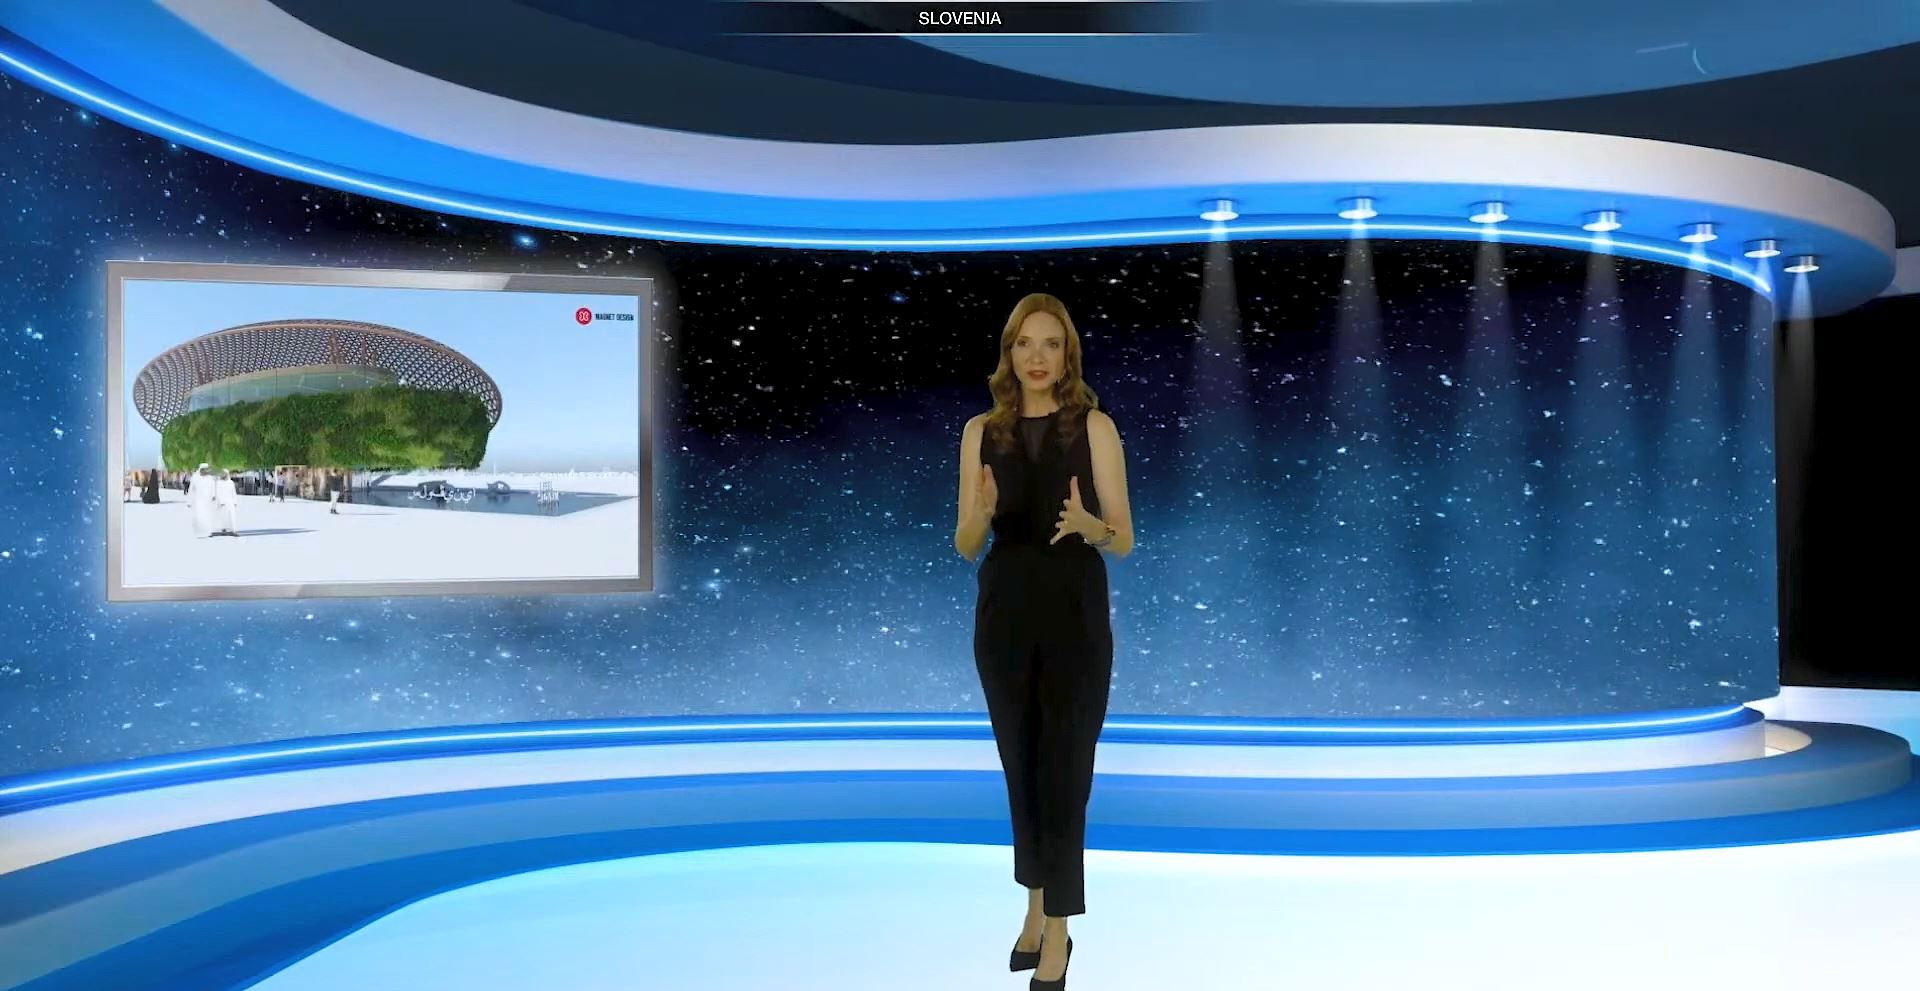 expo 2020 thematic weeks virtual event virtual presentation